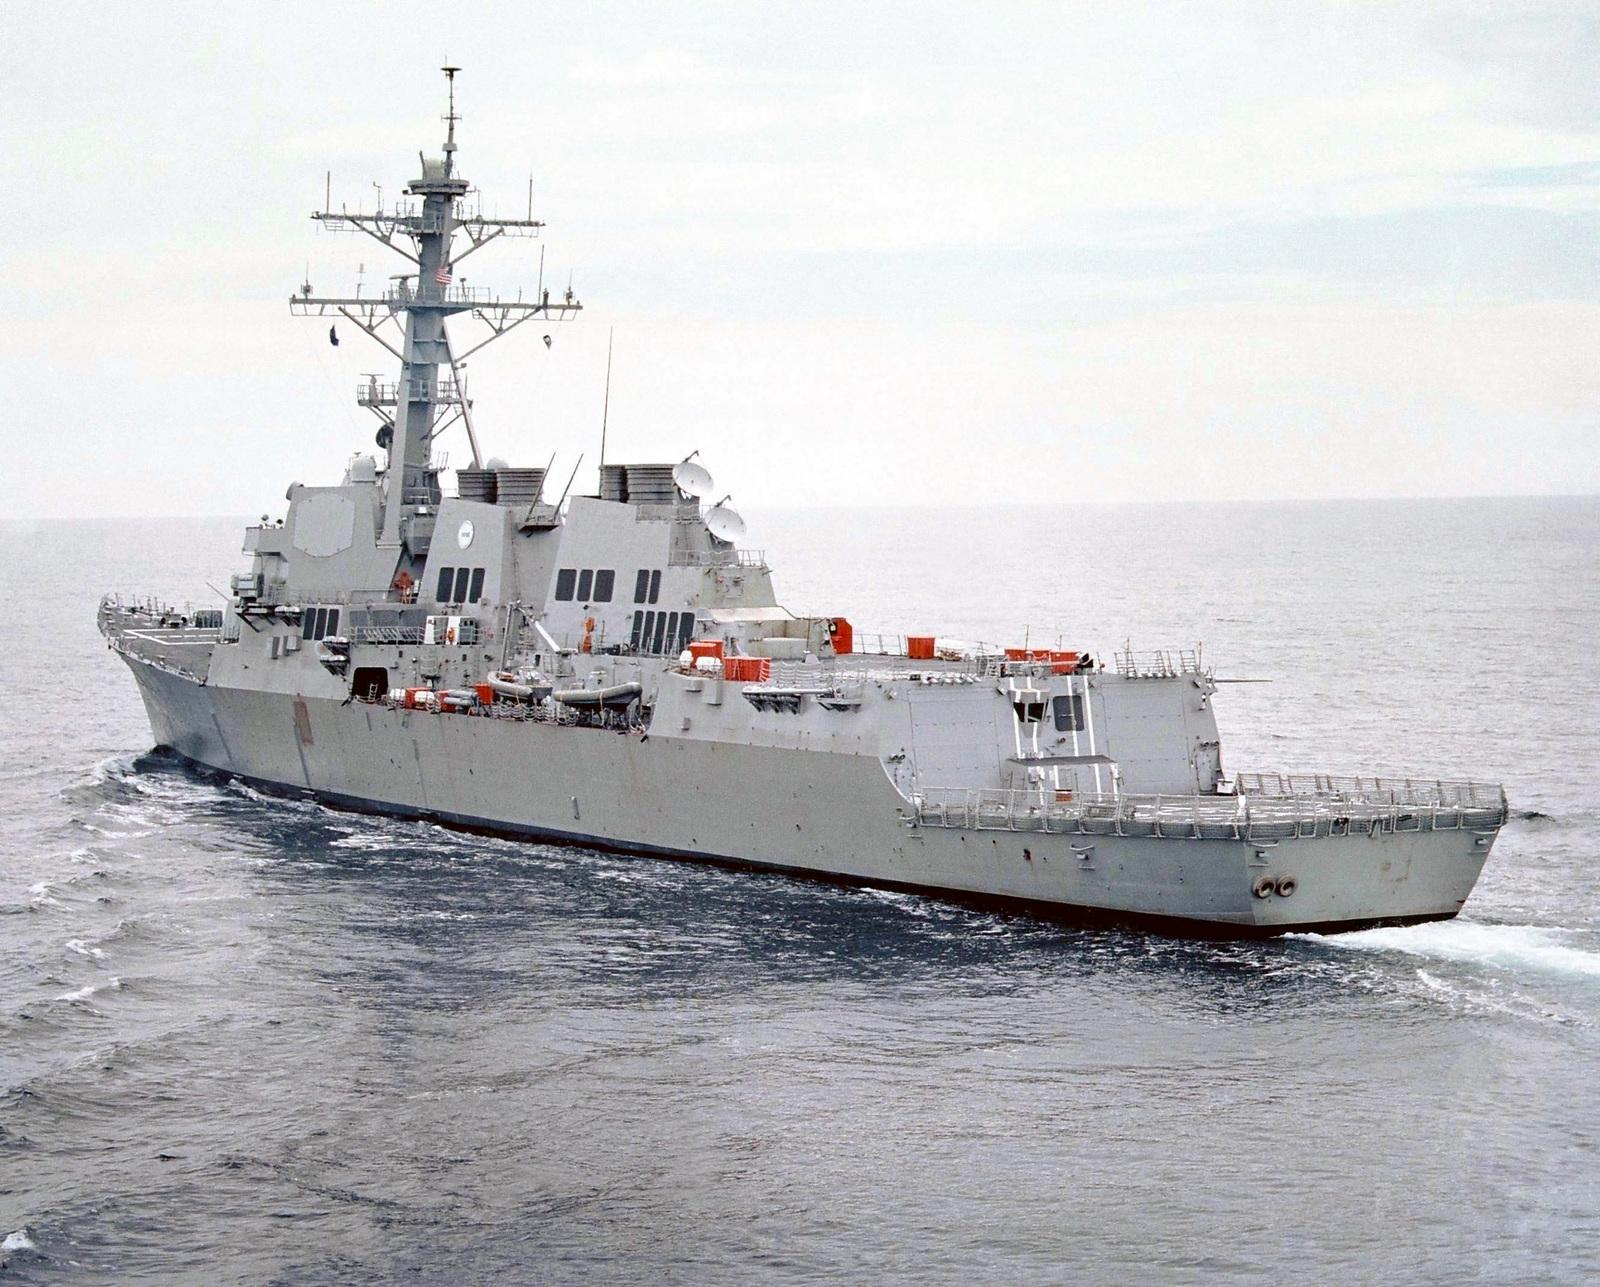 Port quarter stern view of the US Navy (USN) ARLEIGH BURKE CLASS